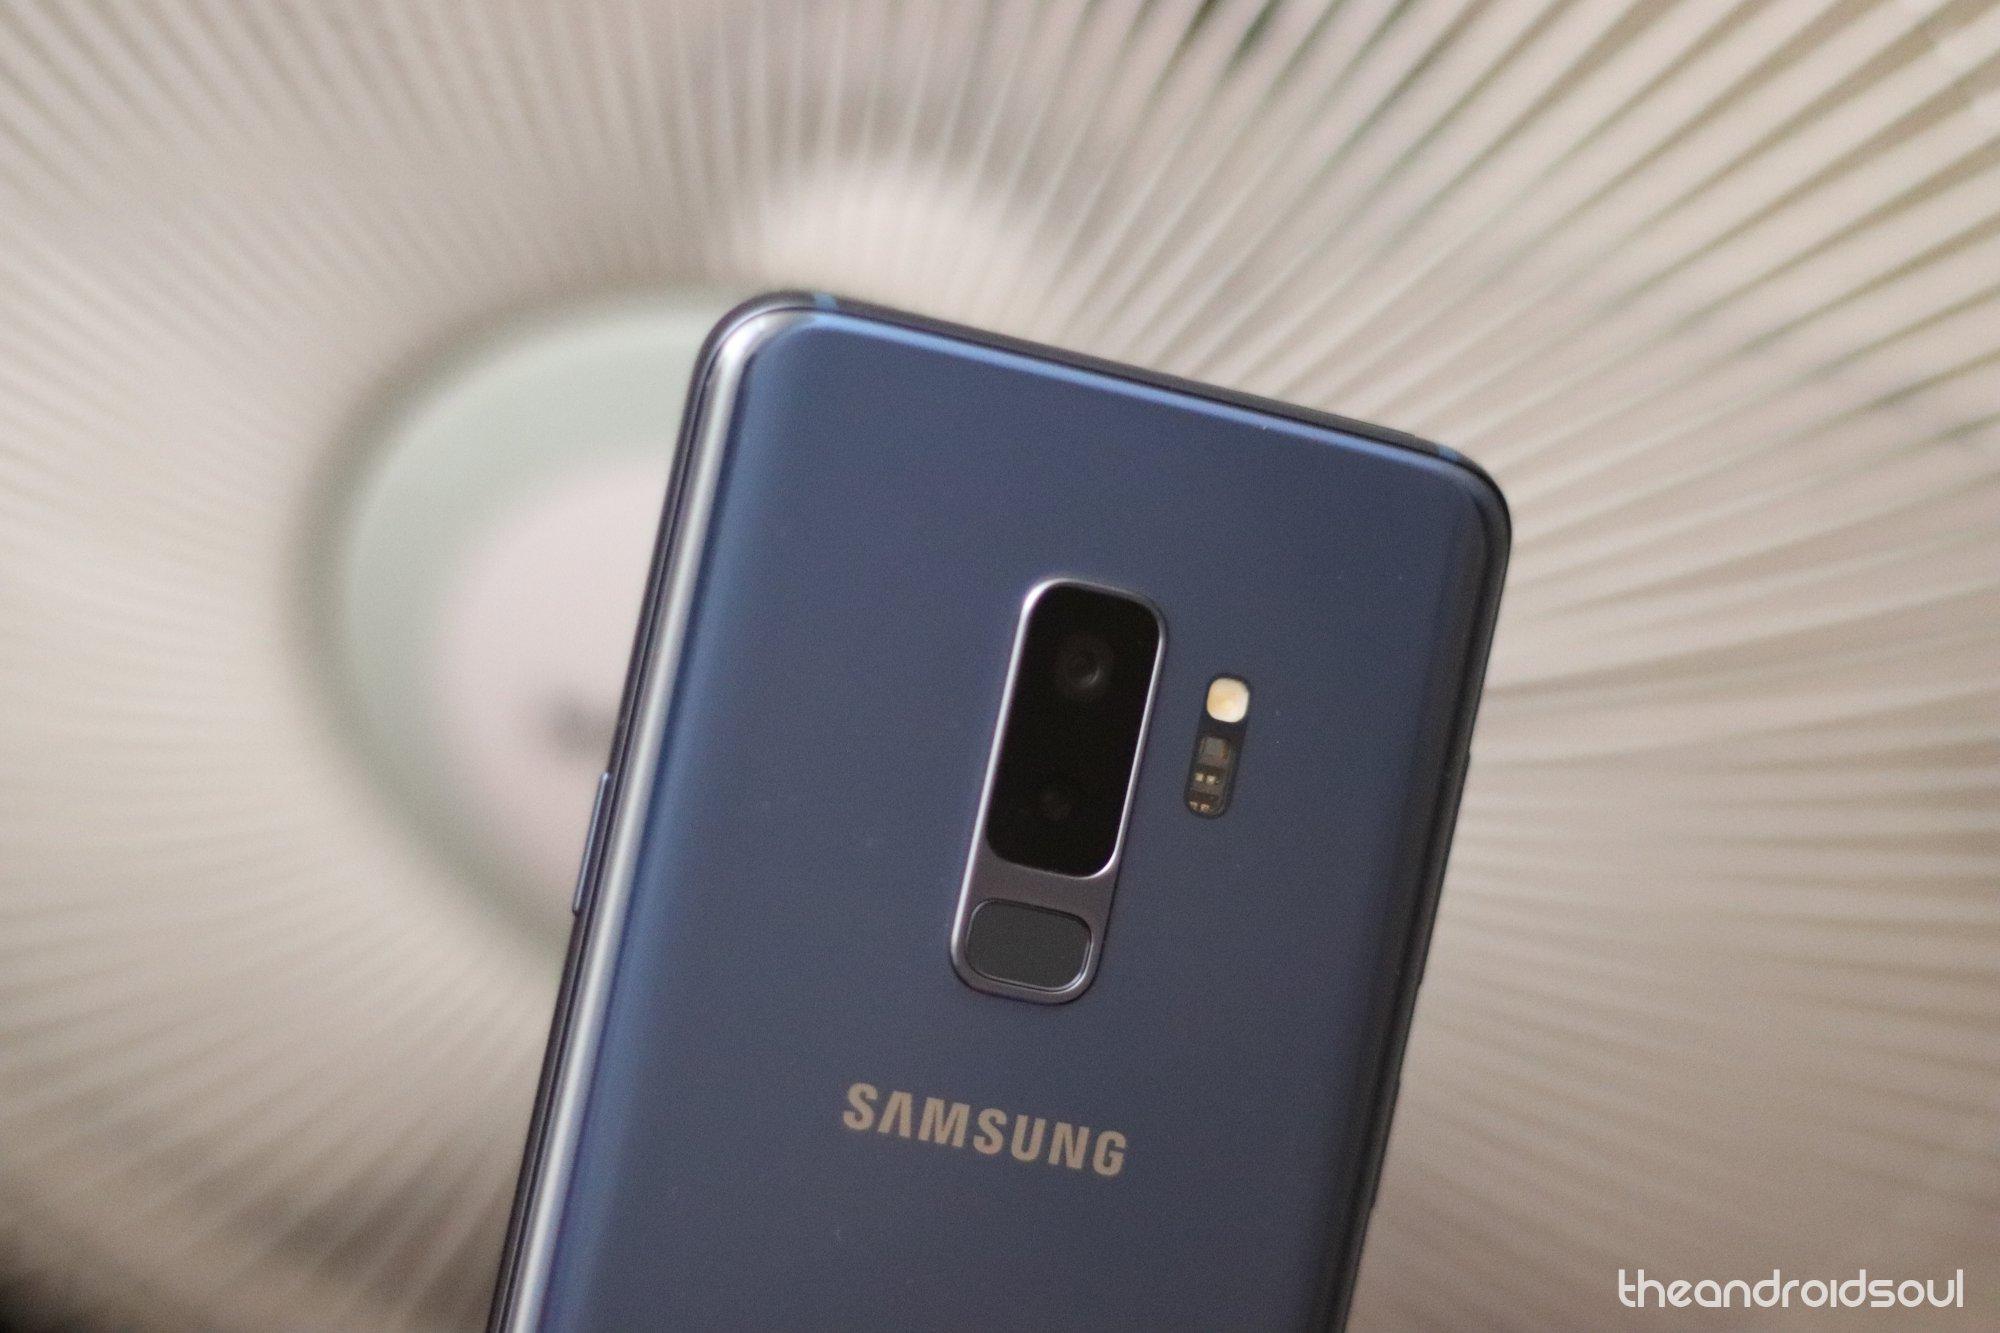 Galaxy-S9-Plus-One-UI